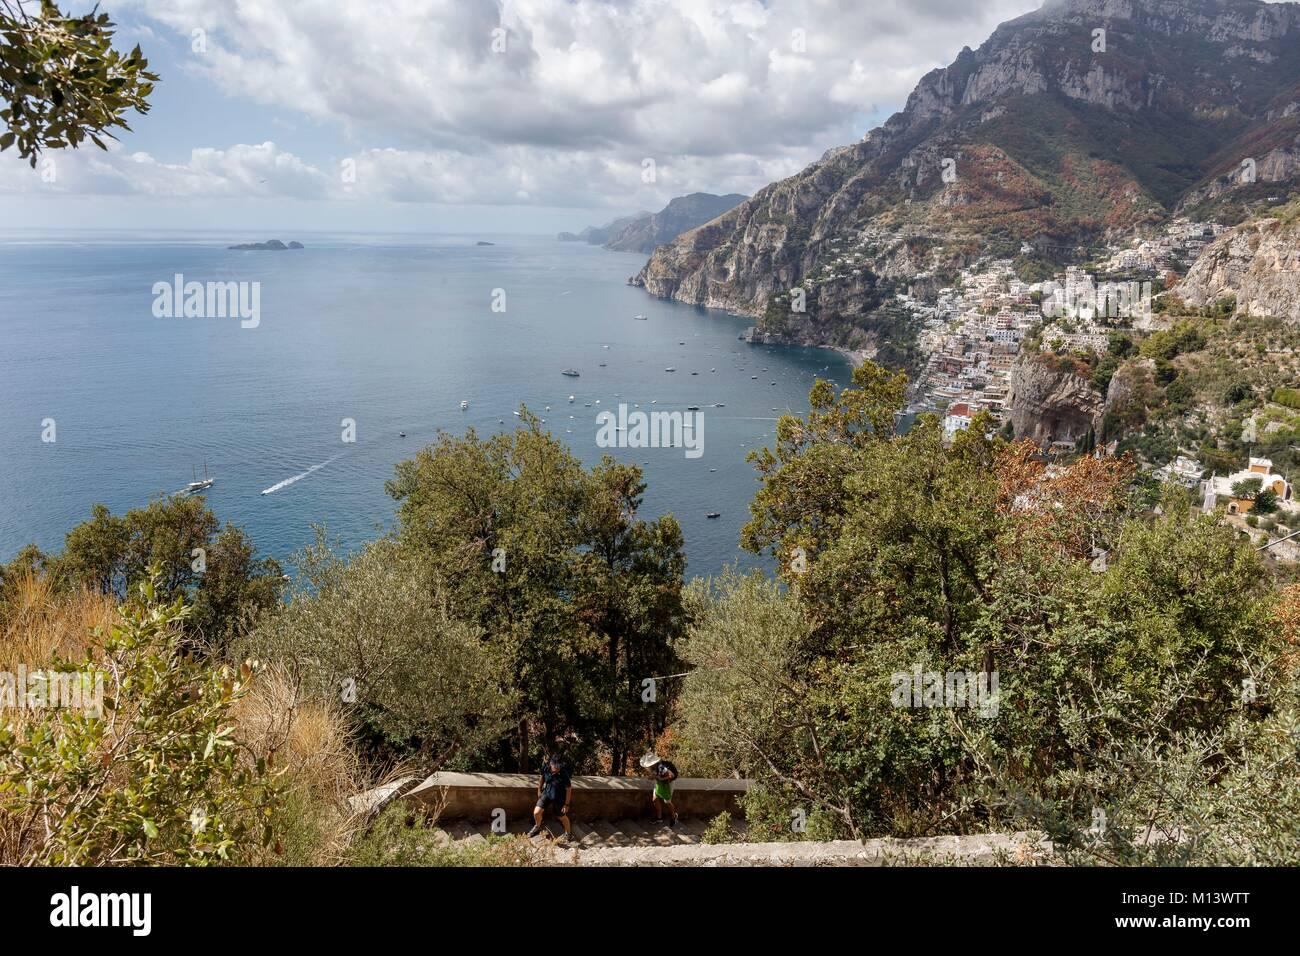 Italy, Campania, Bomerano, Amalfi coast listed as World Heritage by UNESCO, Sentiero degli Dei (path of the Gods), - Stock Image